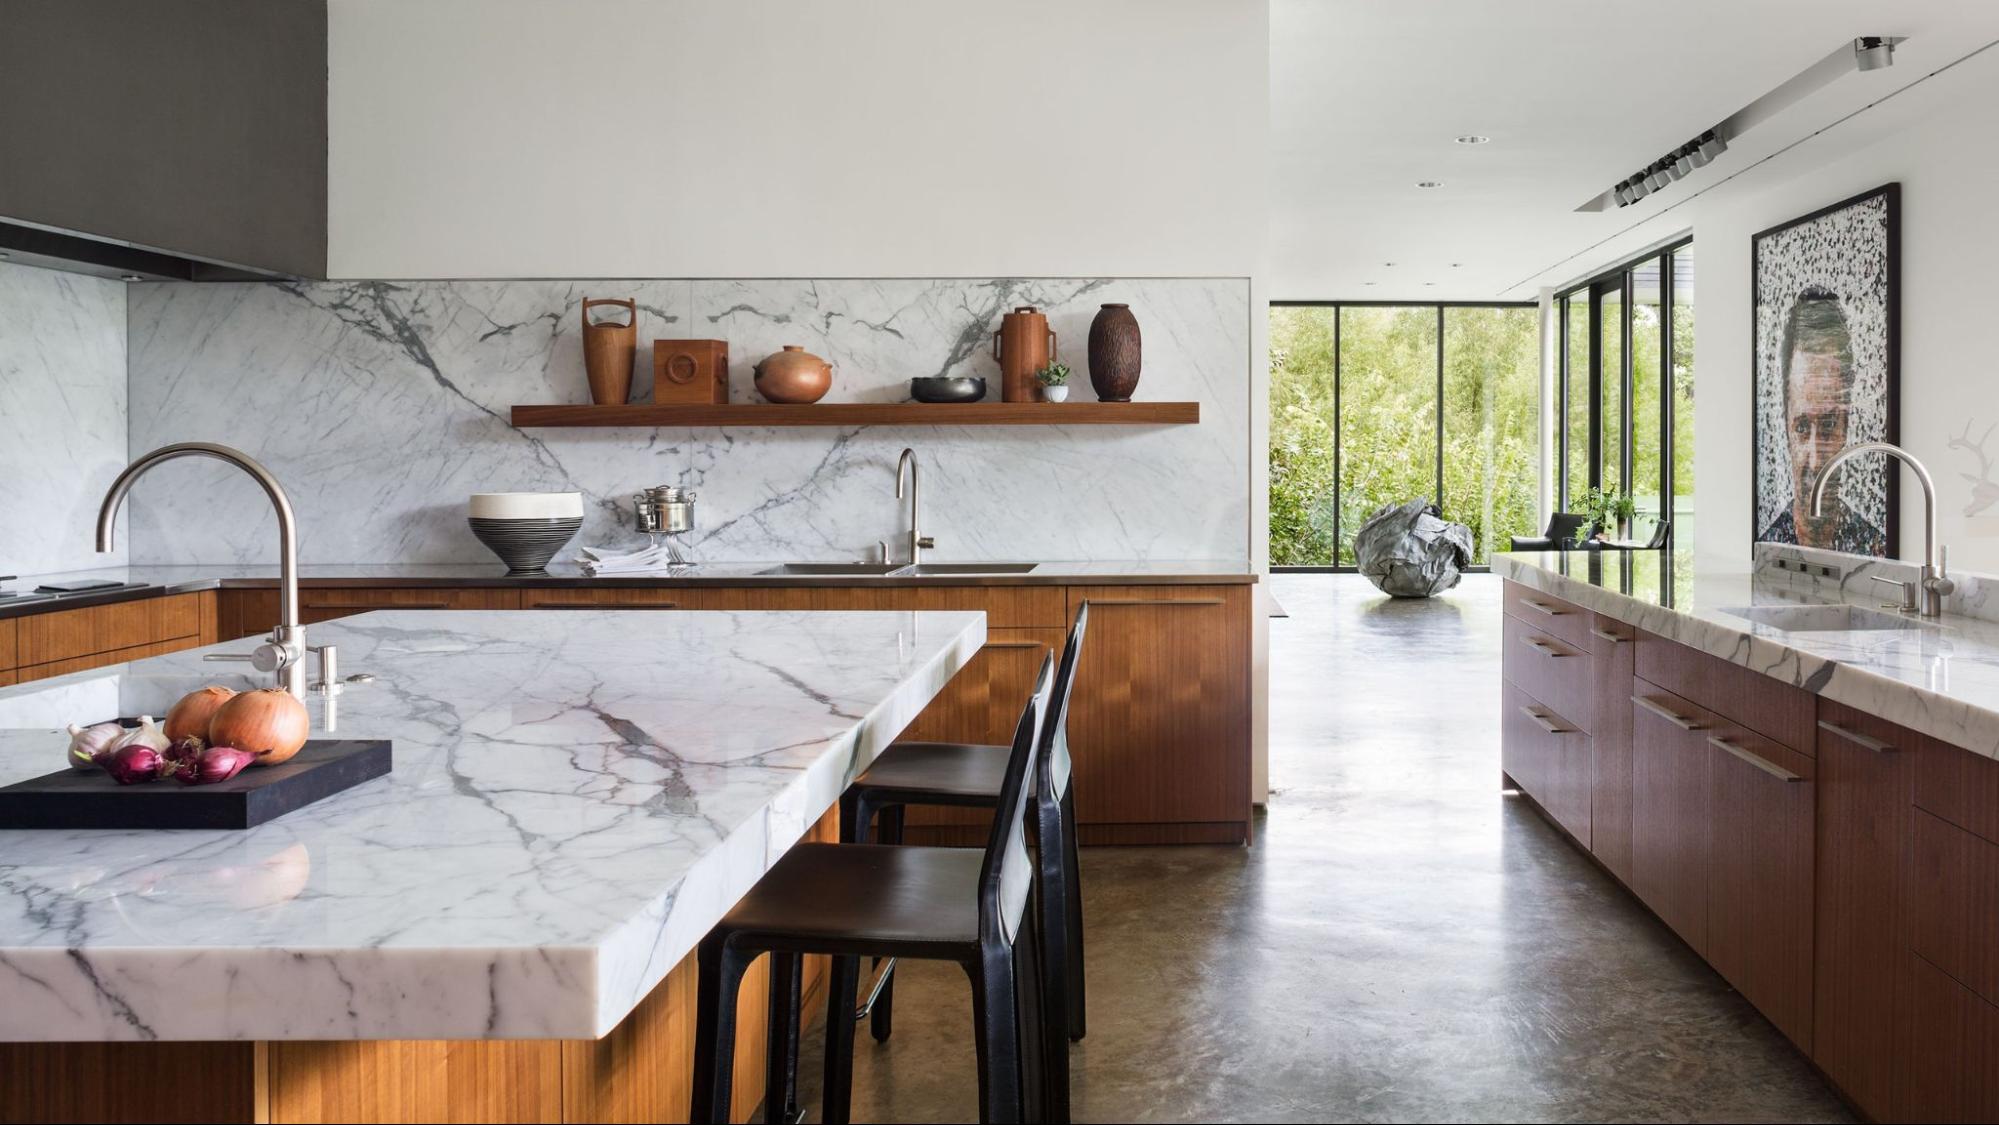 Bianco Marble Tiles On Kitchen Countertops And Backsplash